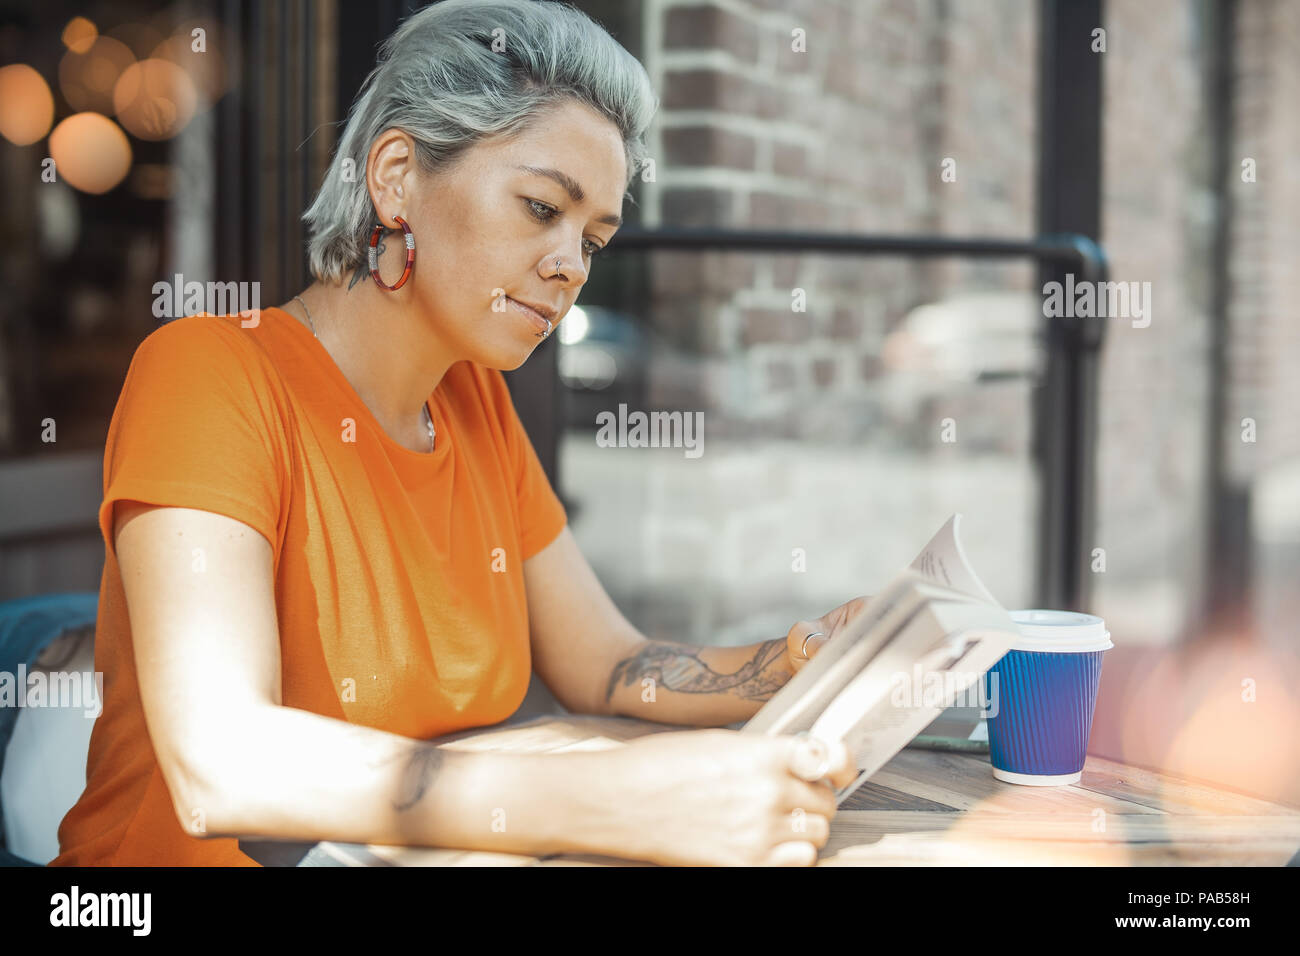 Belle fille blonde tatouée reading book Photo Stock